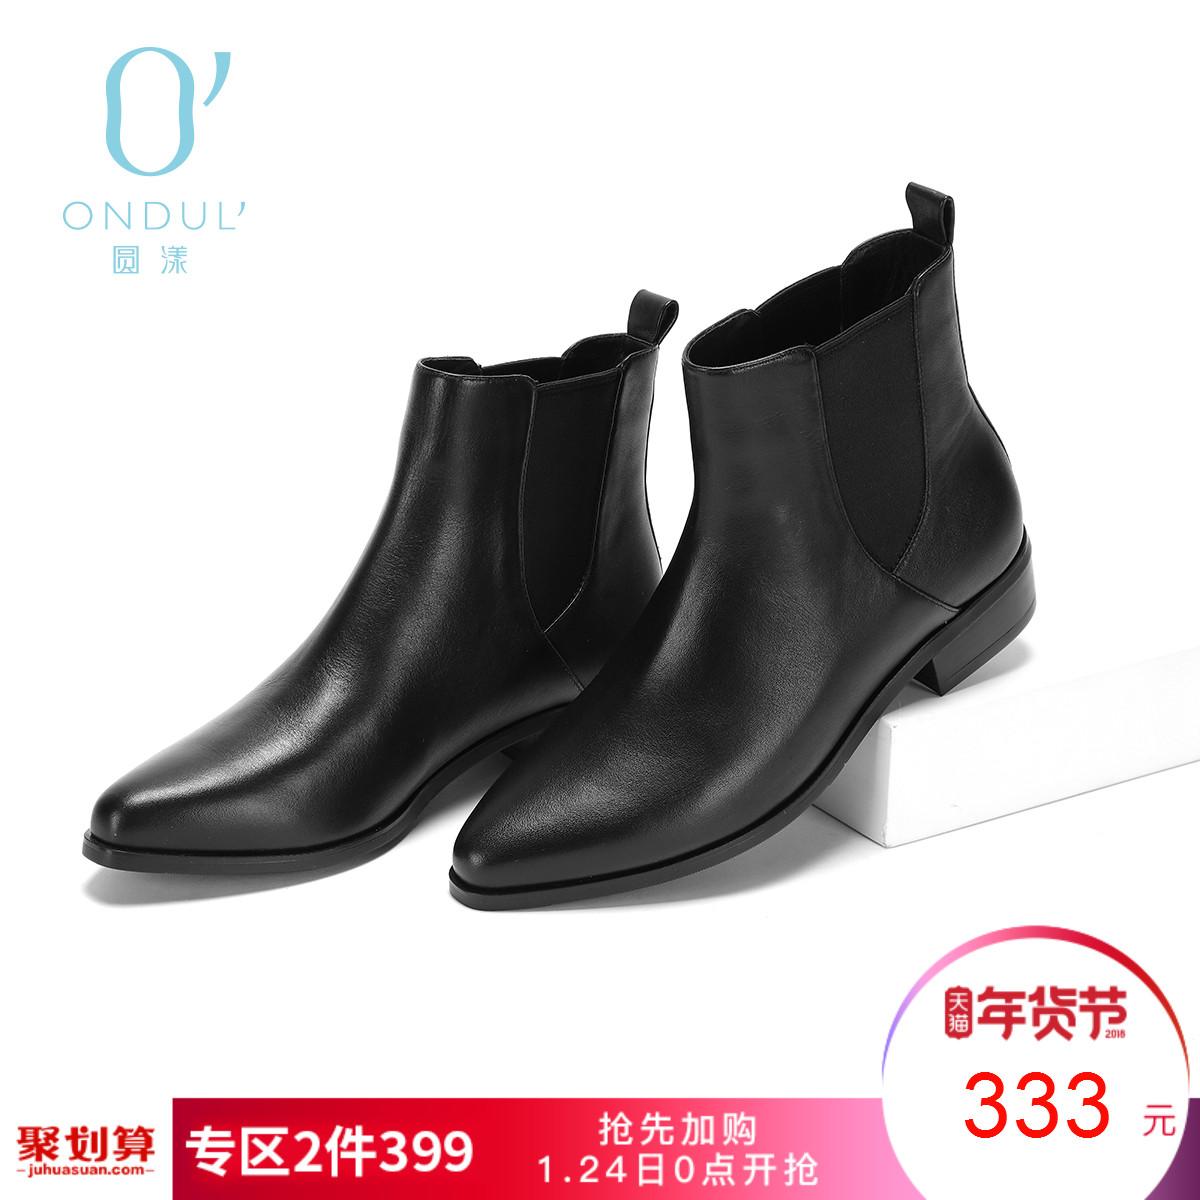 ONDUL/圆漾冬靴冬欧美牛皮及踝靴拼接切尔西短靴薄款女冬靴子